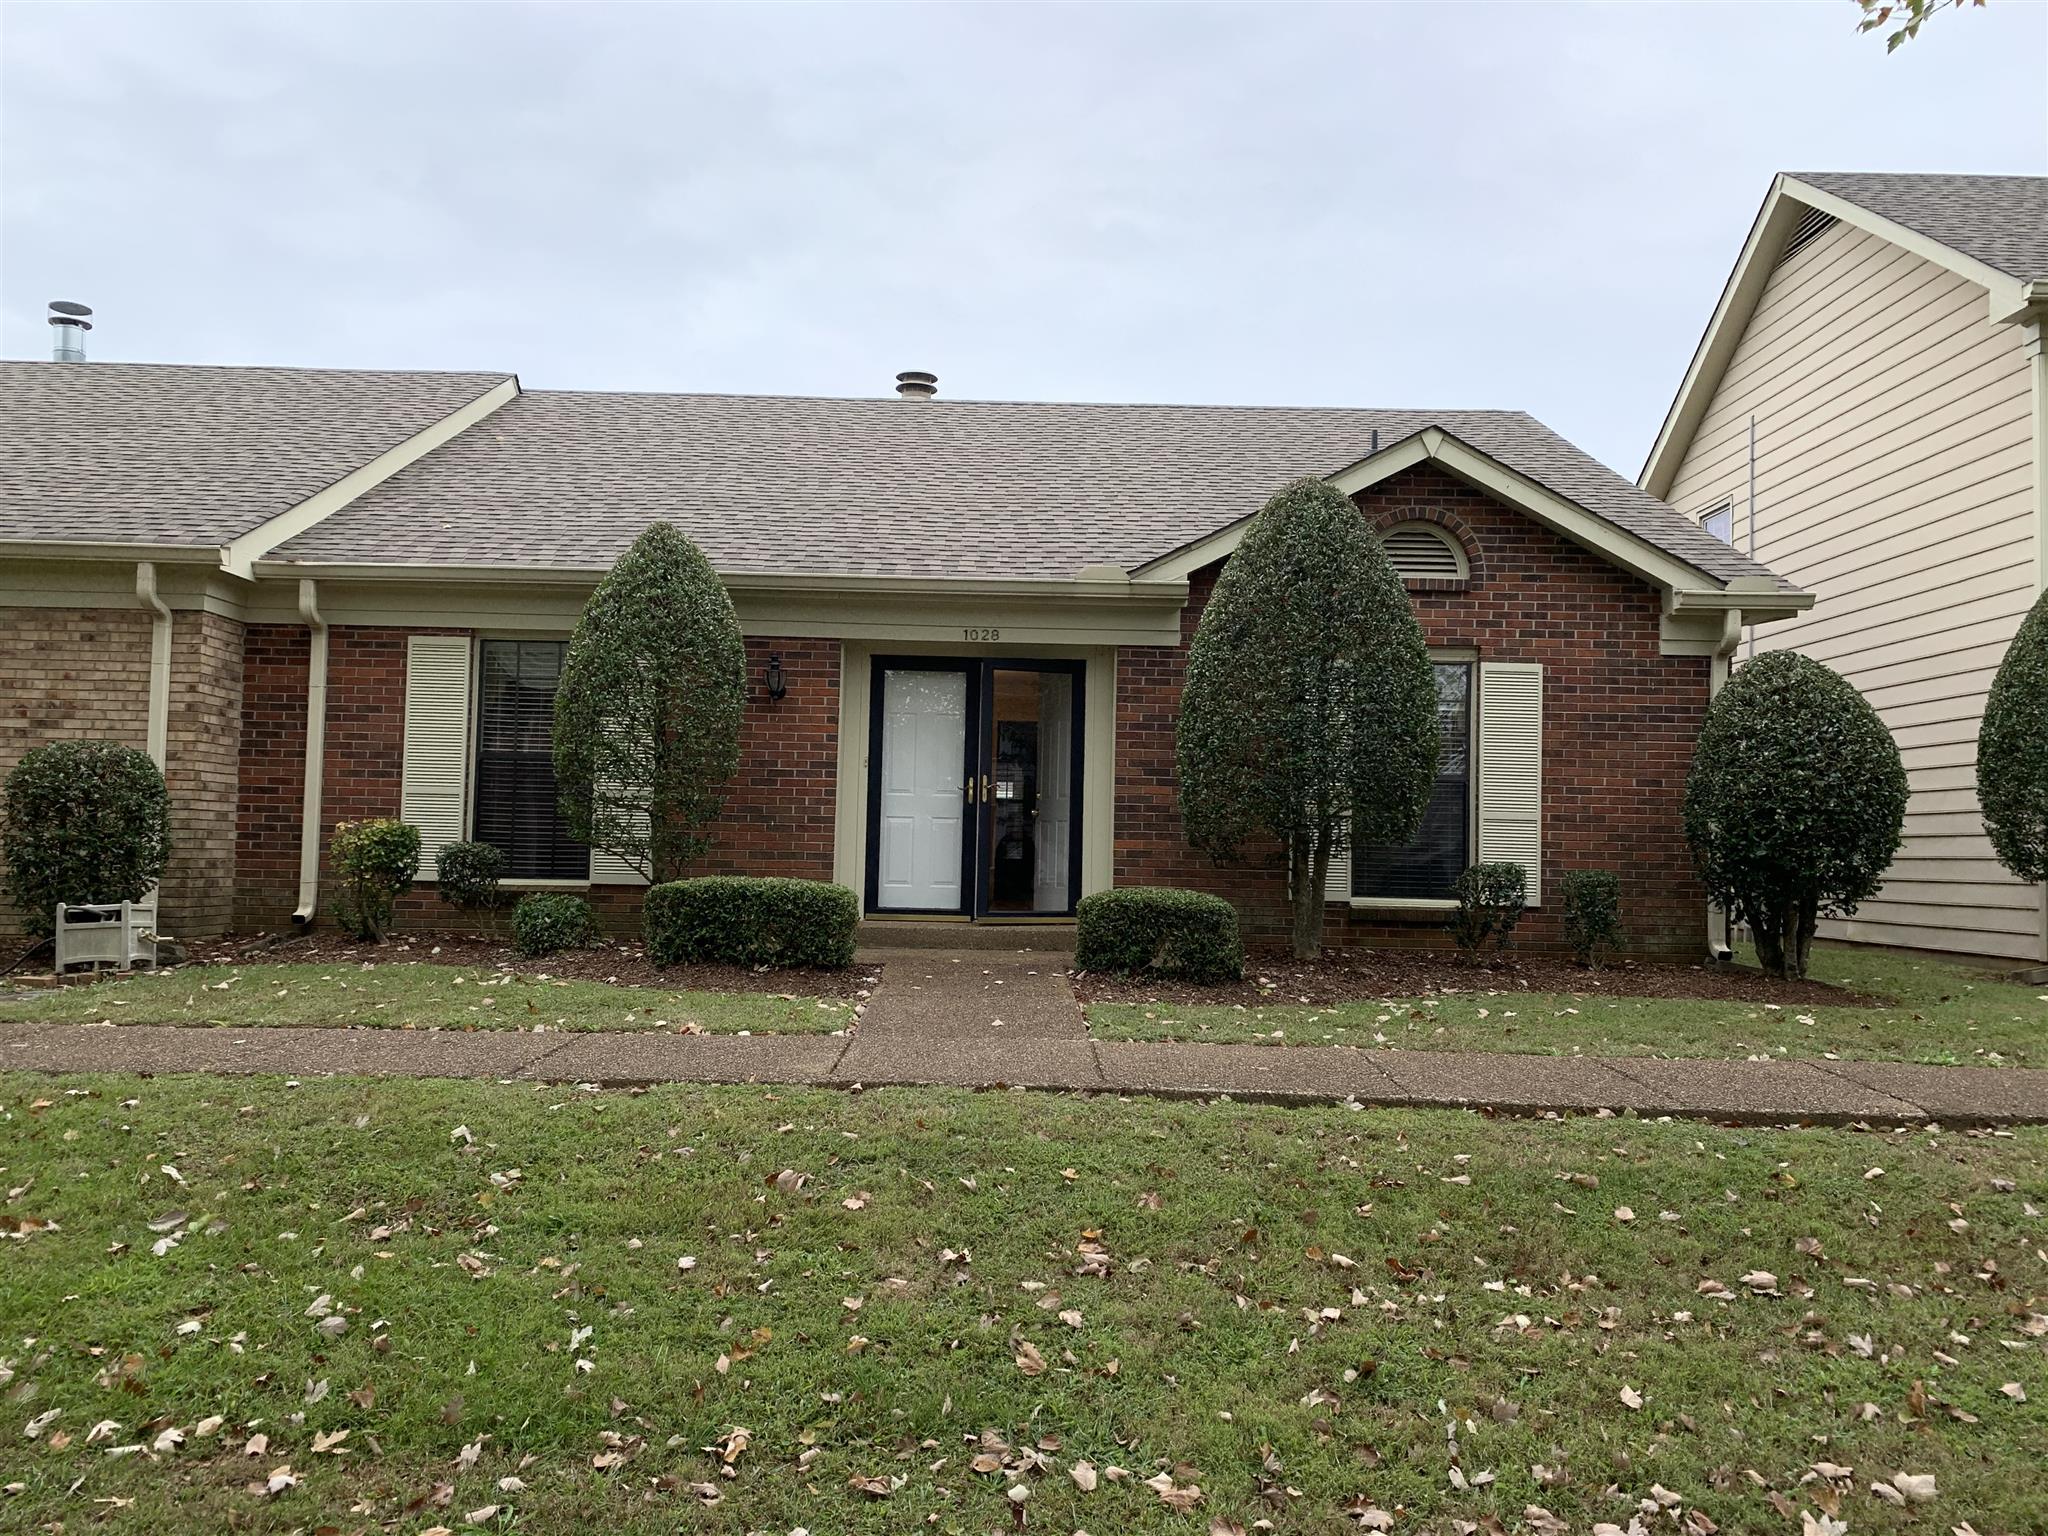 1028 General George Patton Rd, Nashville, TN 37221 - Nashville, TN real estate listing